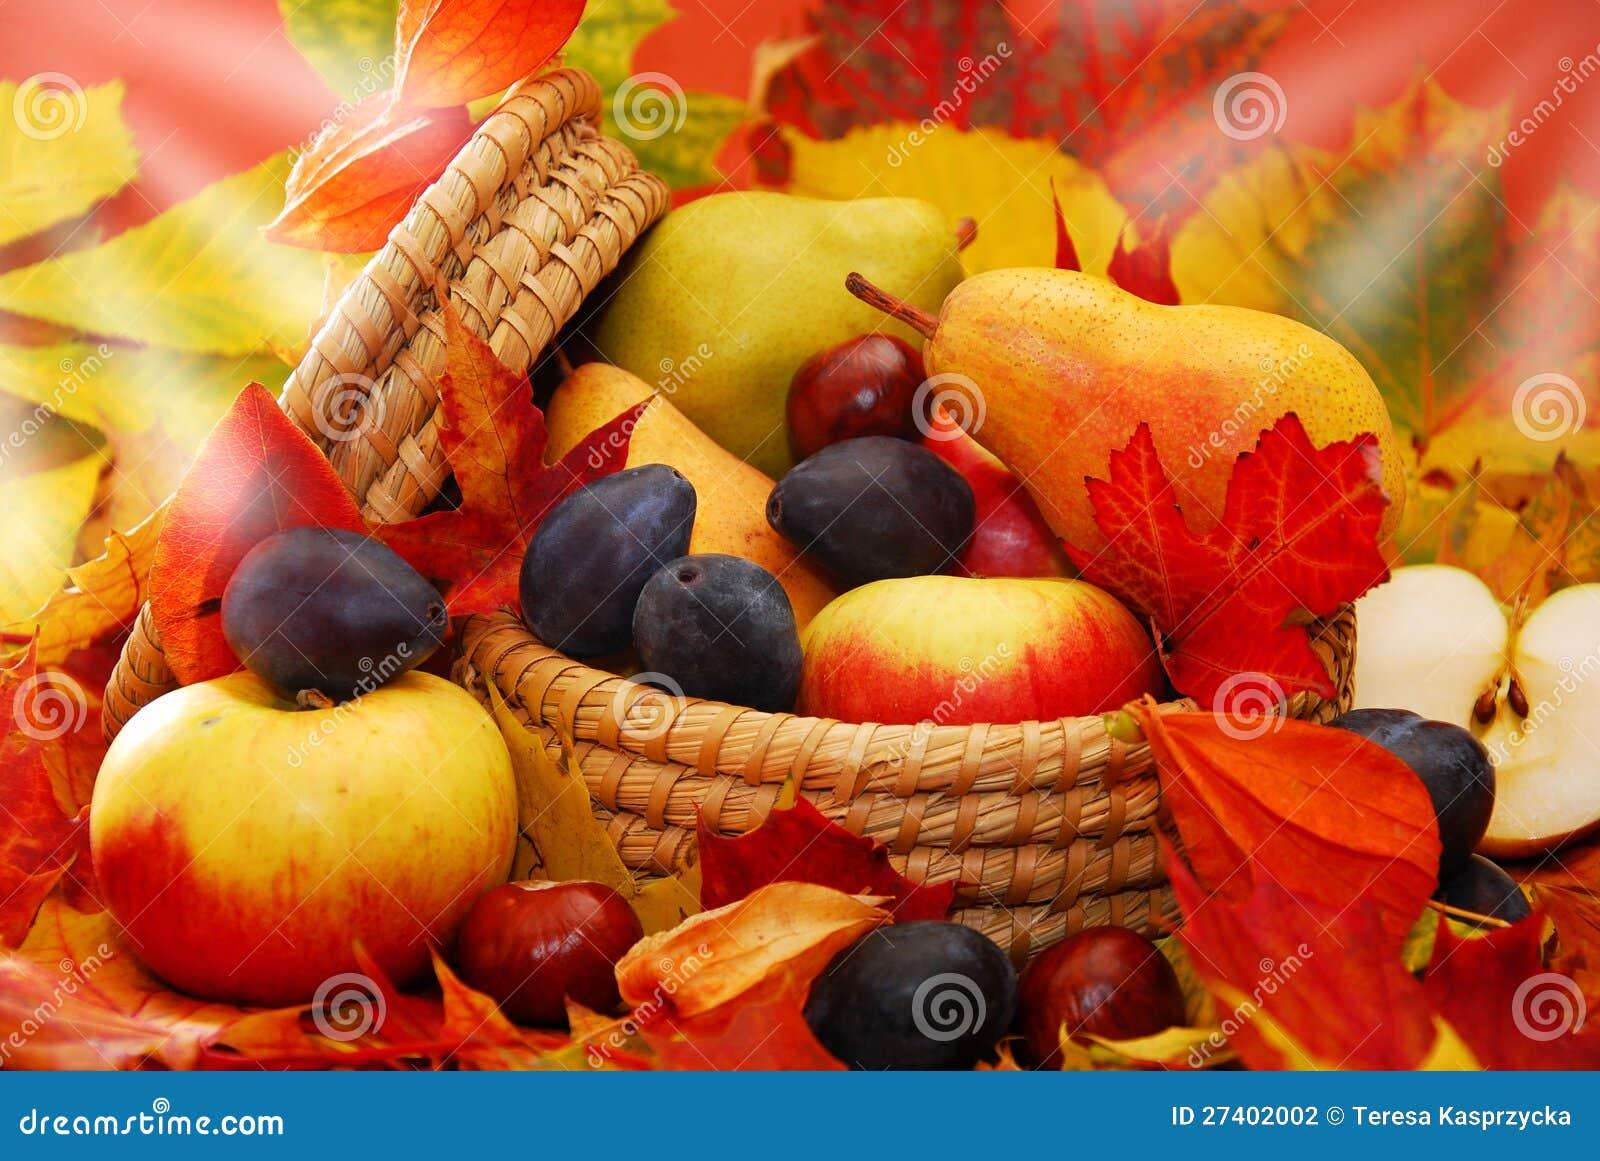 panier des fruits d 39 automne photo stock image du jardin nourriture 27402002. Black Bedroom Furniture Sets. Home Design Ideas